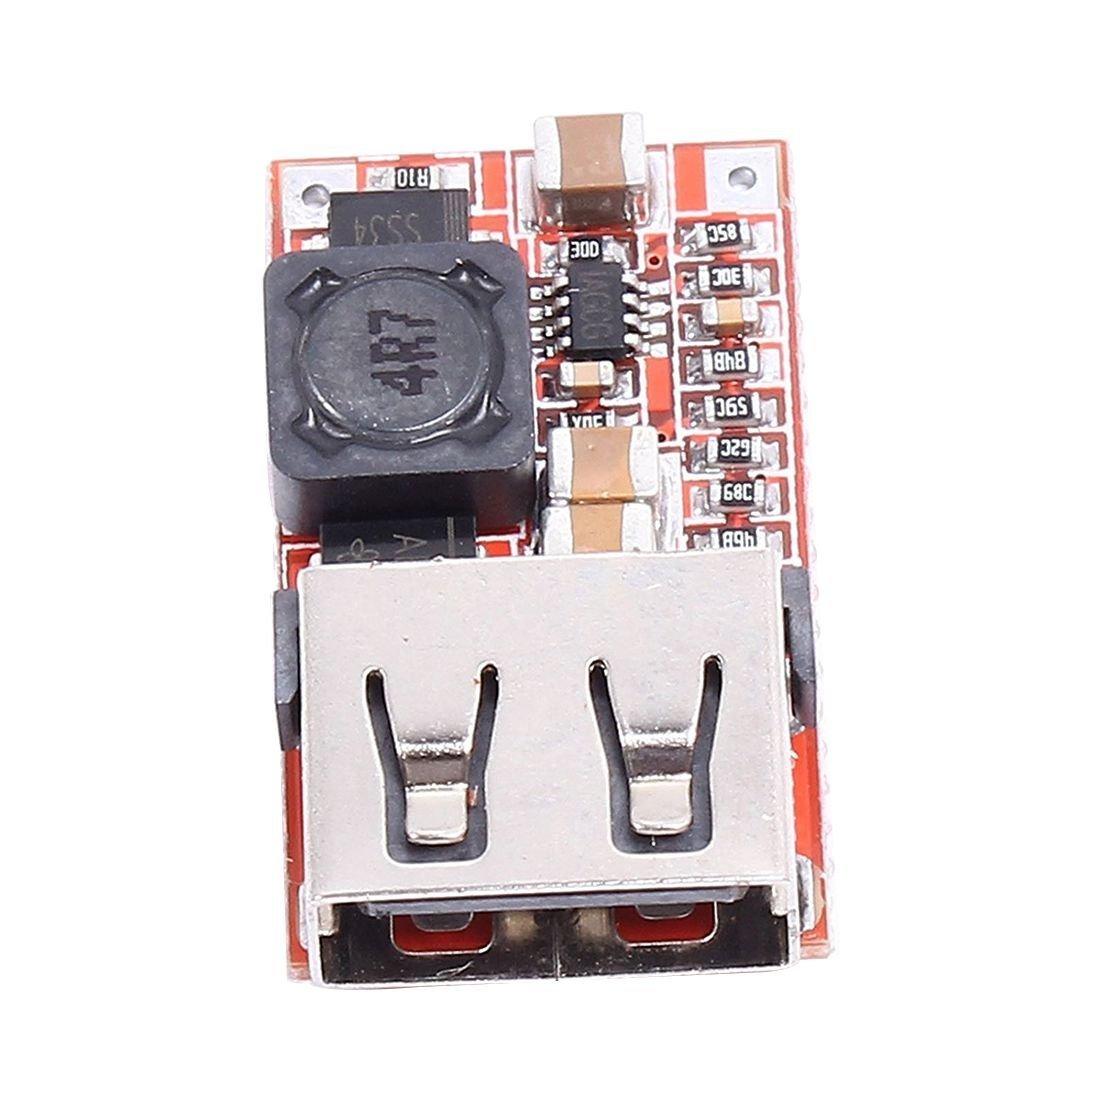 TOOGOO(R) 6-24V 12V/24V to 5V 3A Car USB Charger Module DC Buck step down Converter DIY Red